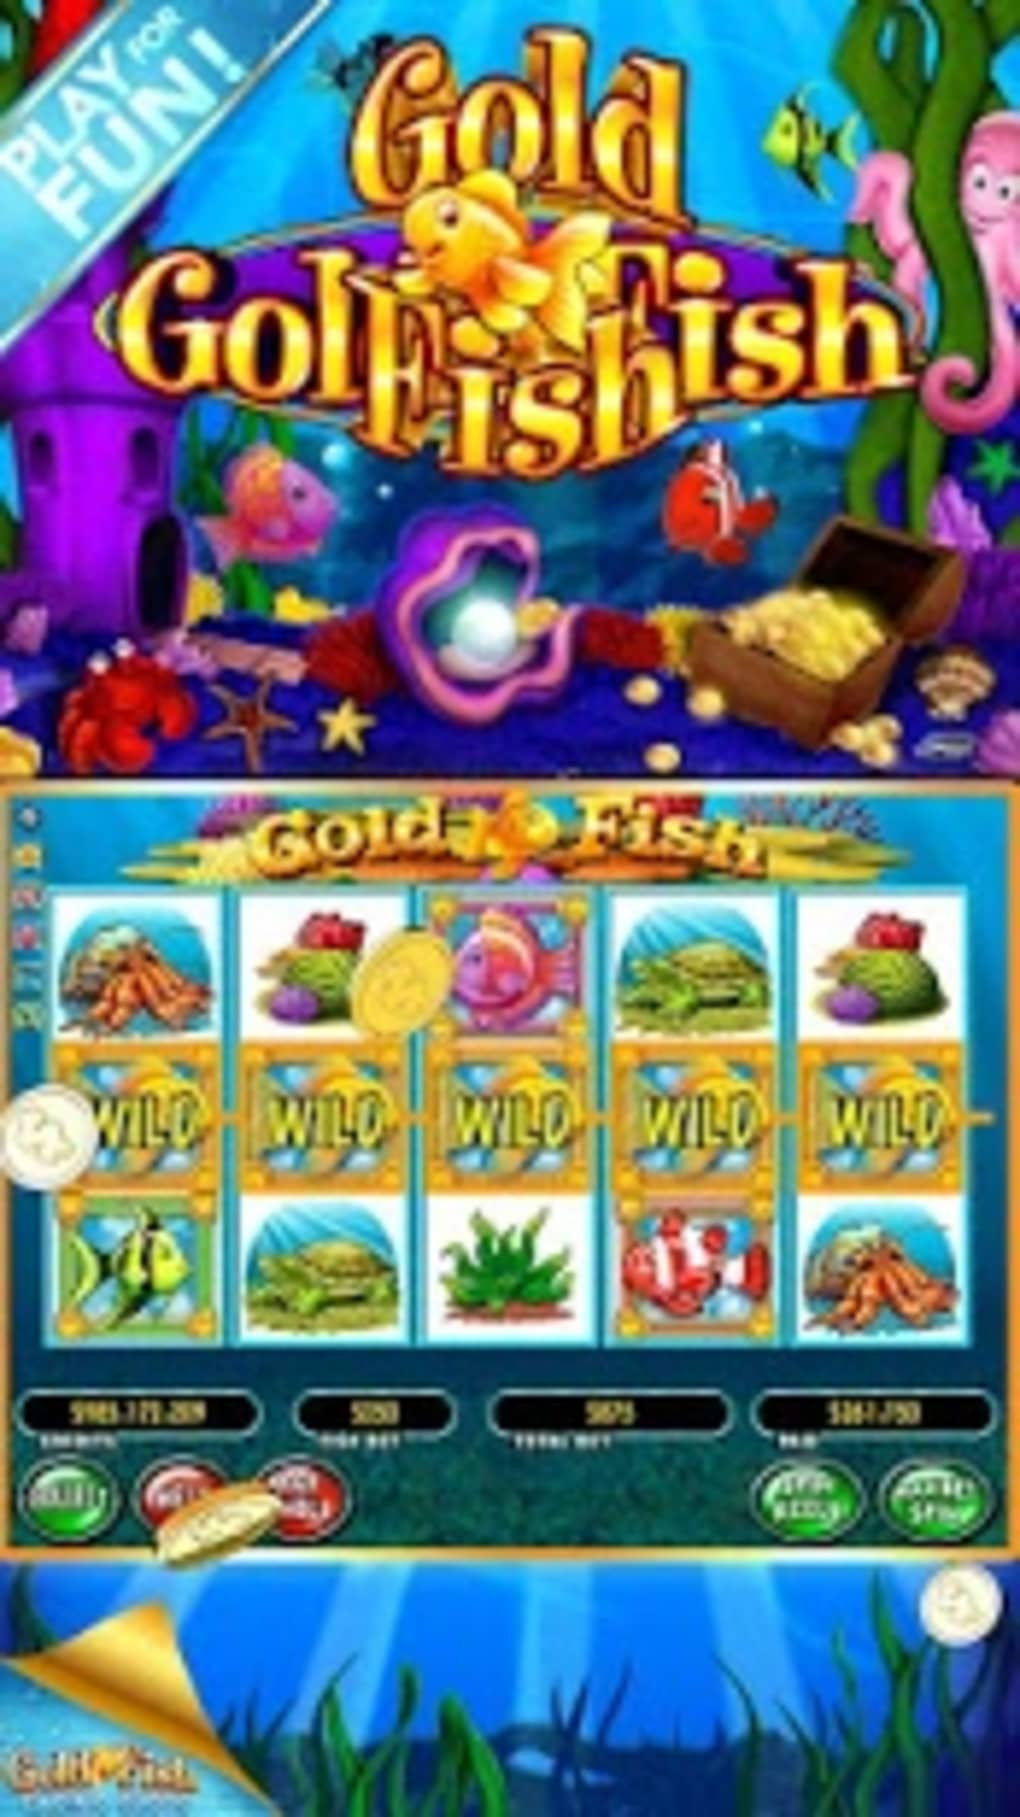 goldfish casino slots free download